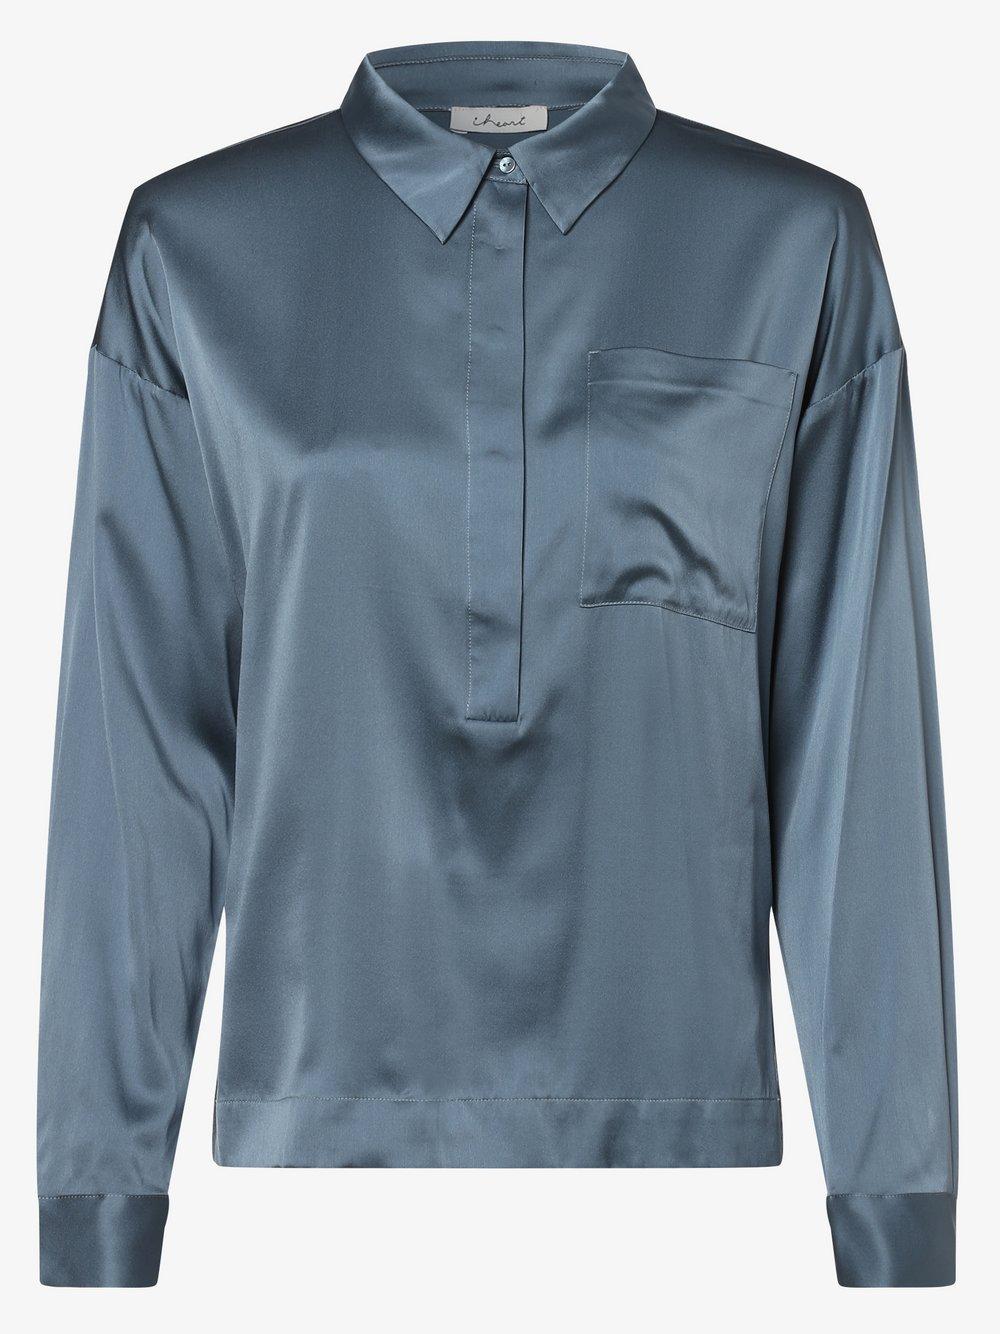 iheart – Bluzka damska z dodatkiem jedwabiu – Estella, niebieski Van Graaf 448232-0001